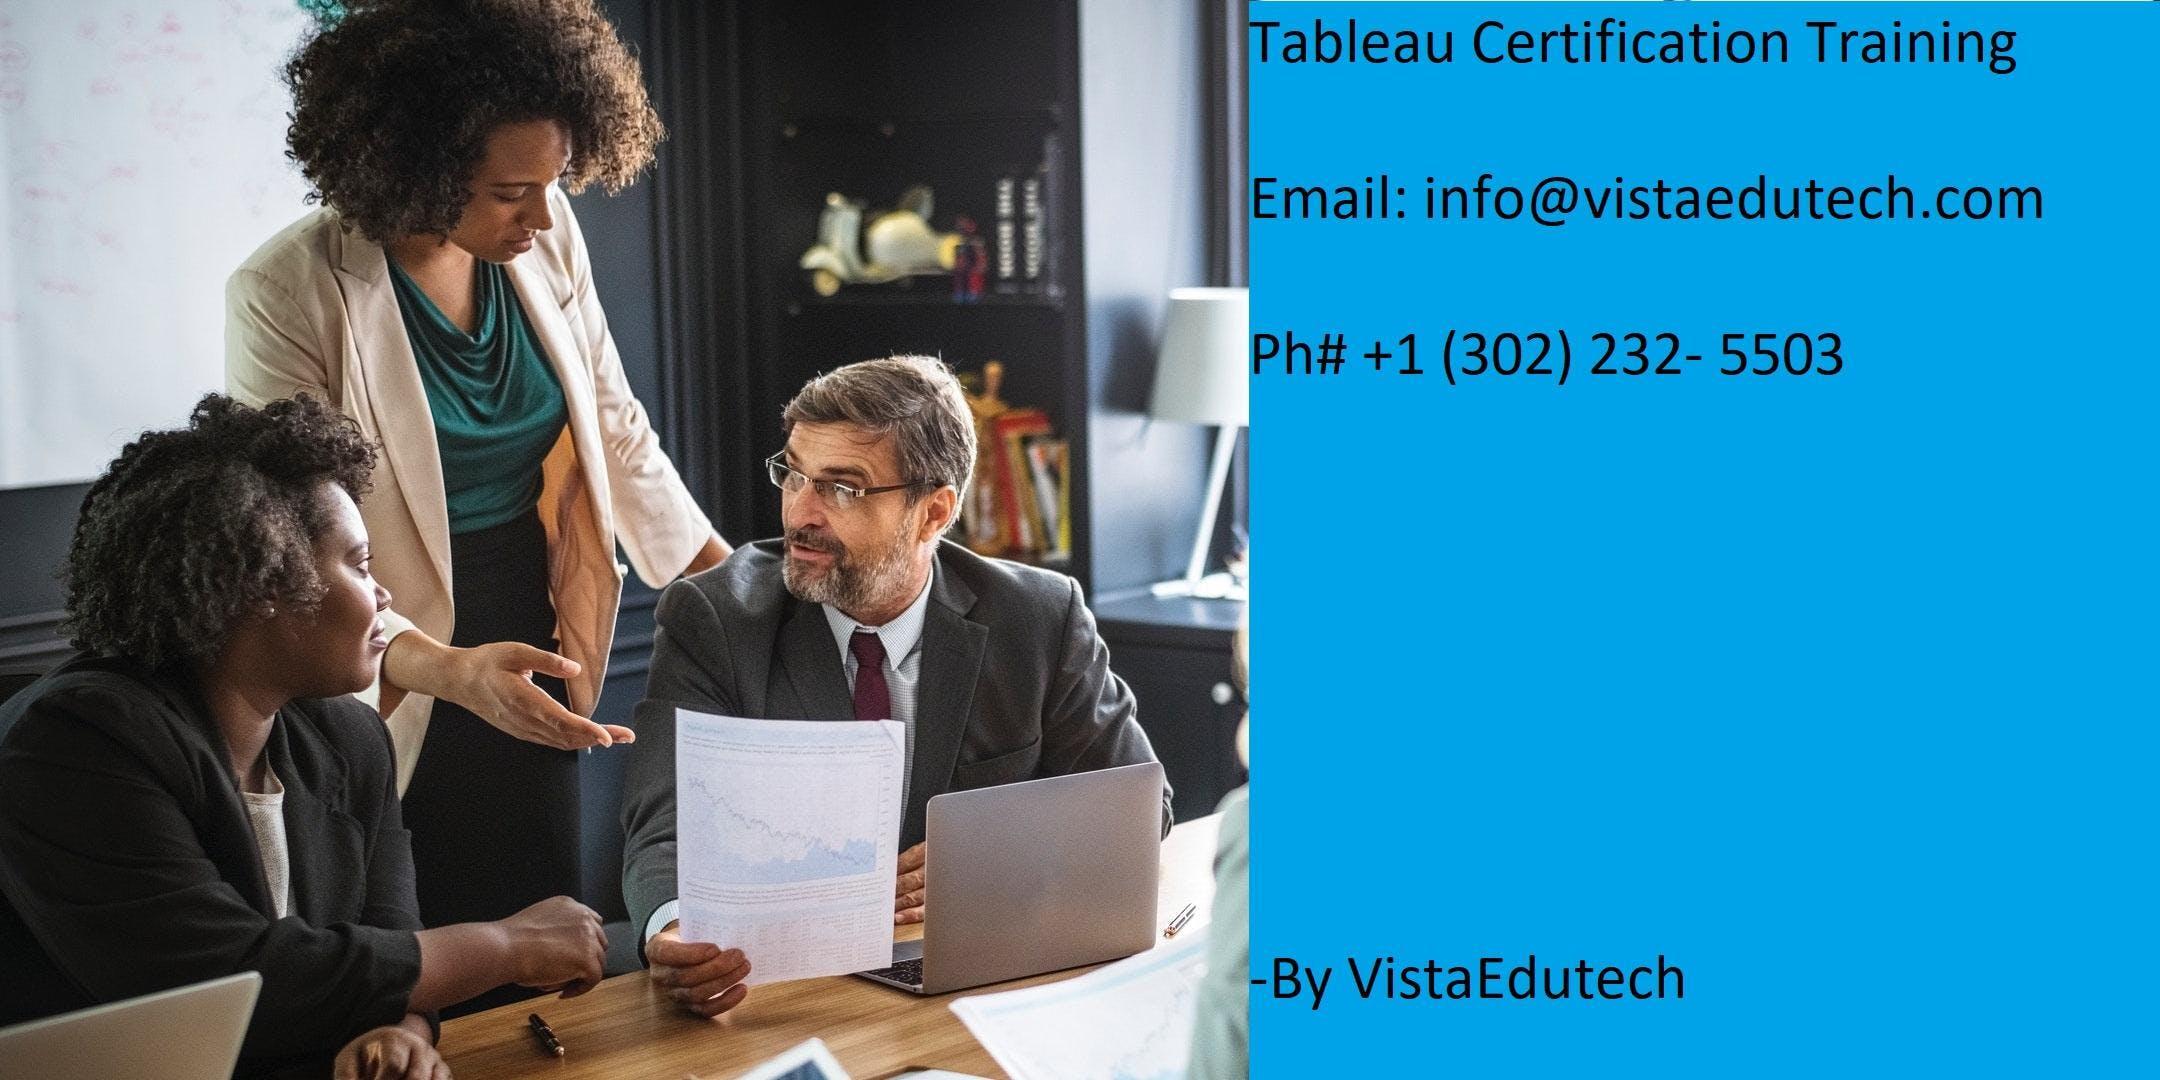 Tableau Certification Training in Evansville, IN